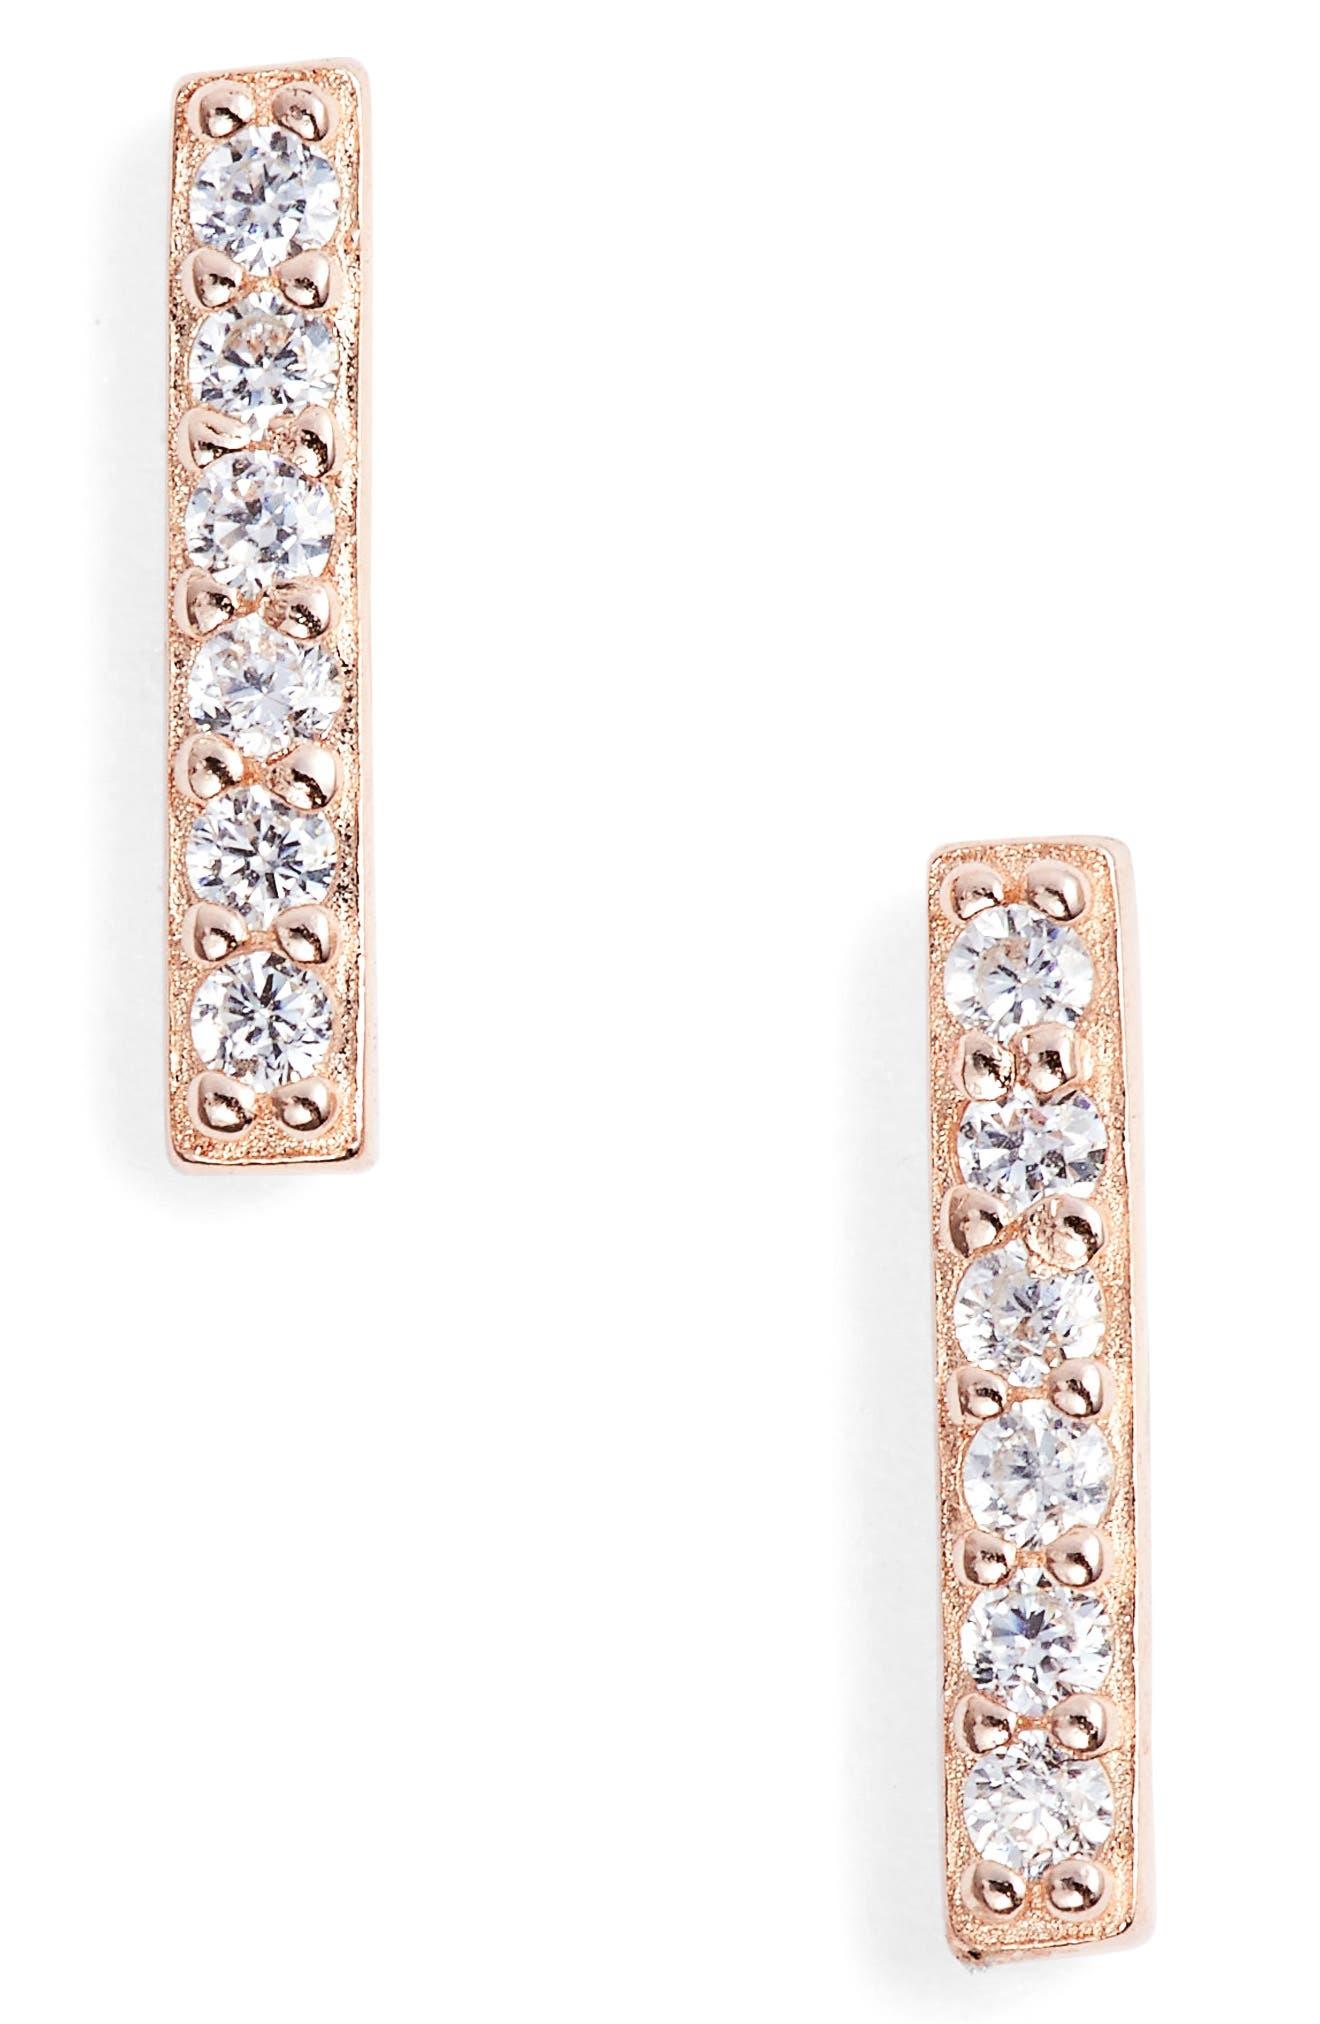 Precious Metal Plated Cubic Zirconia Bar Earrings,                         Main,                         color, Rose Gold